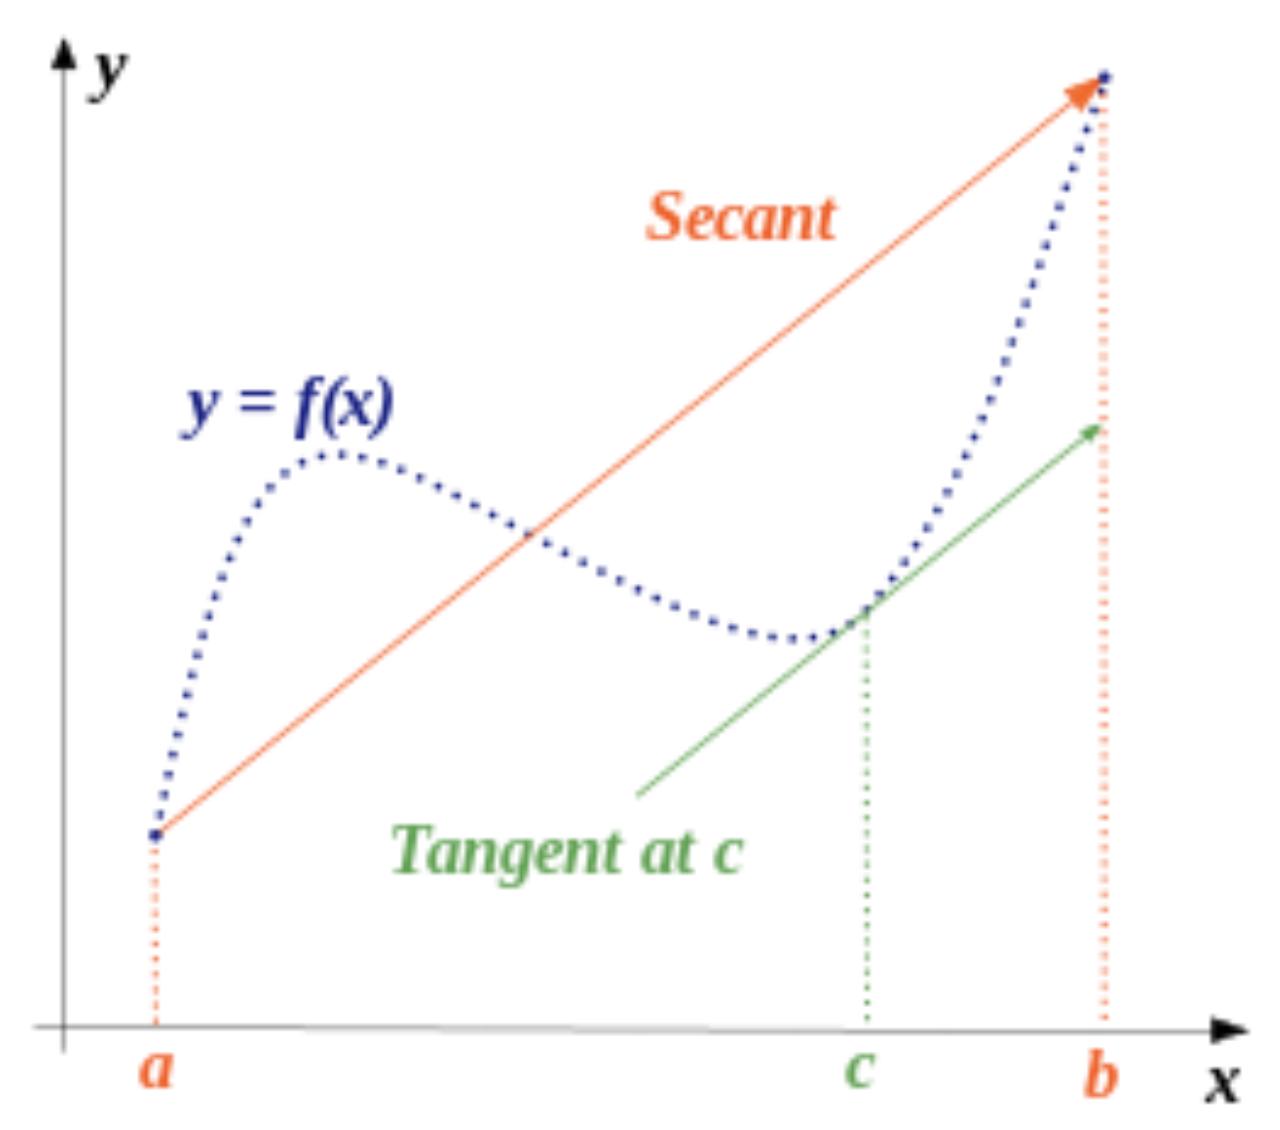 Graph 1: Secant line